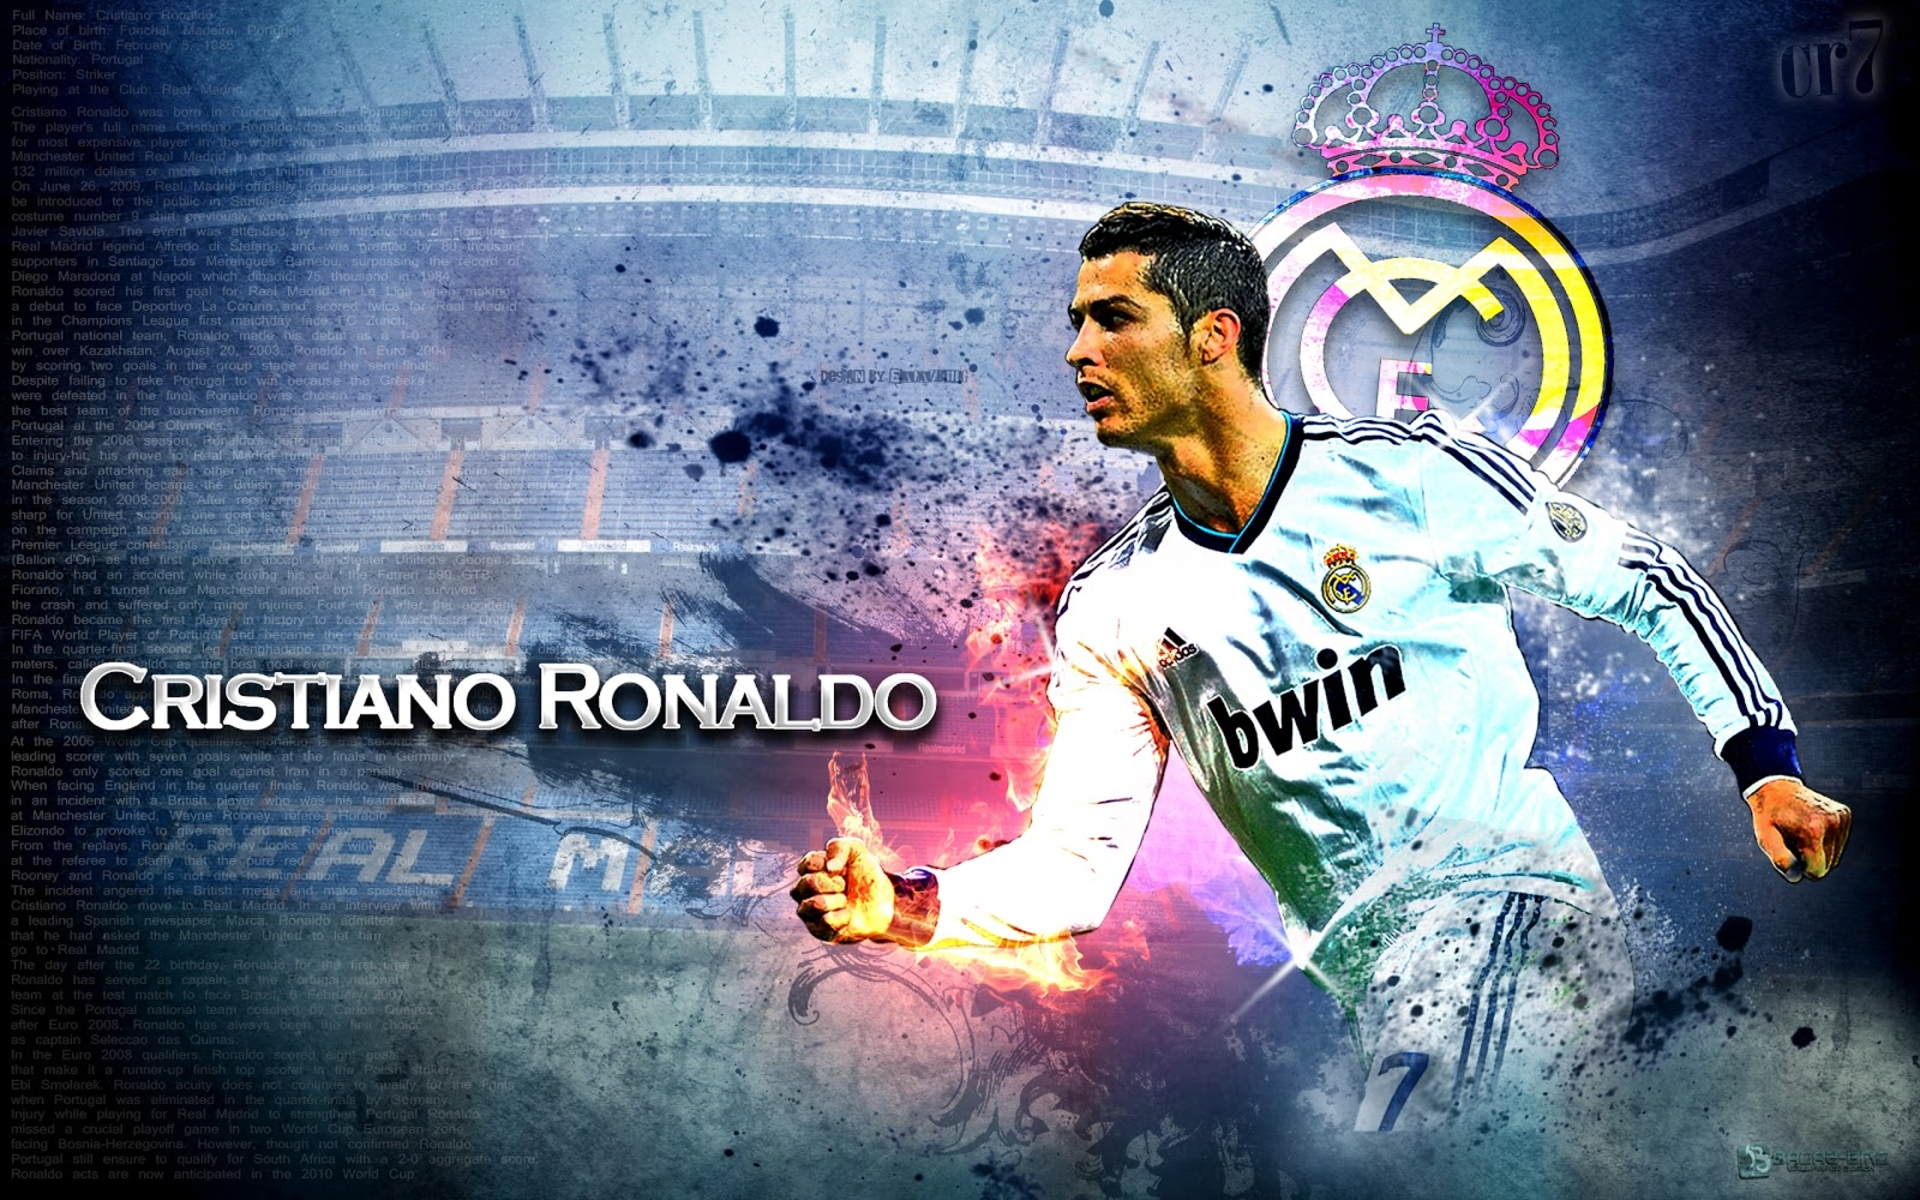 Cristiano Ronaldo HD Wallpaper   HD Wallpapers 1920x1200